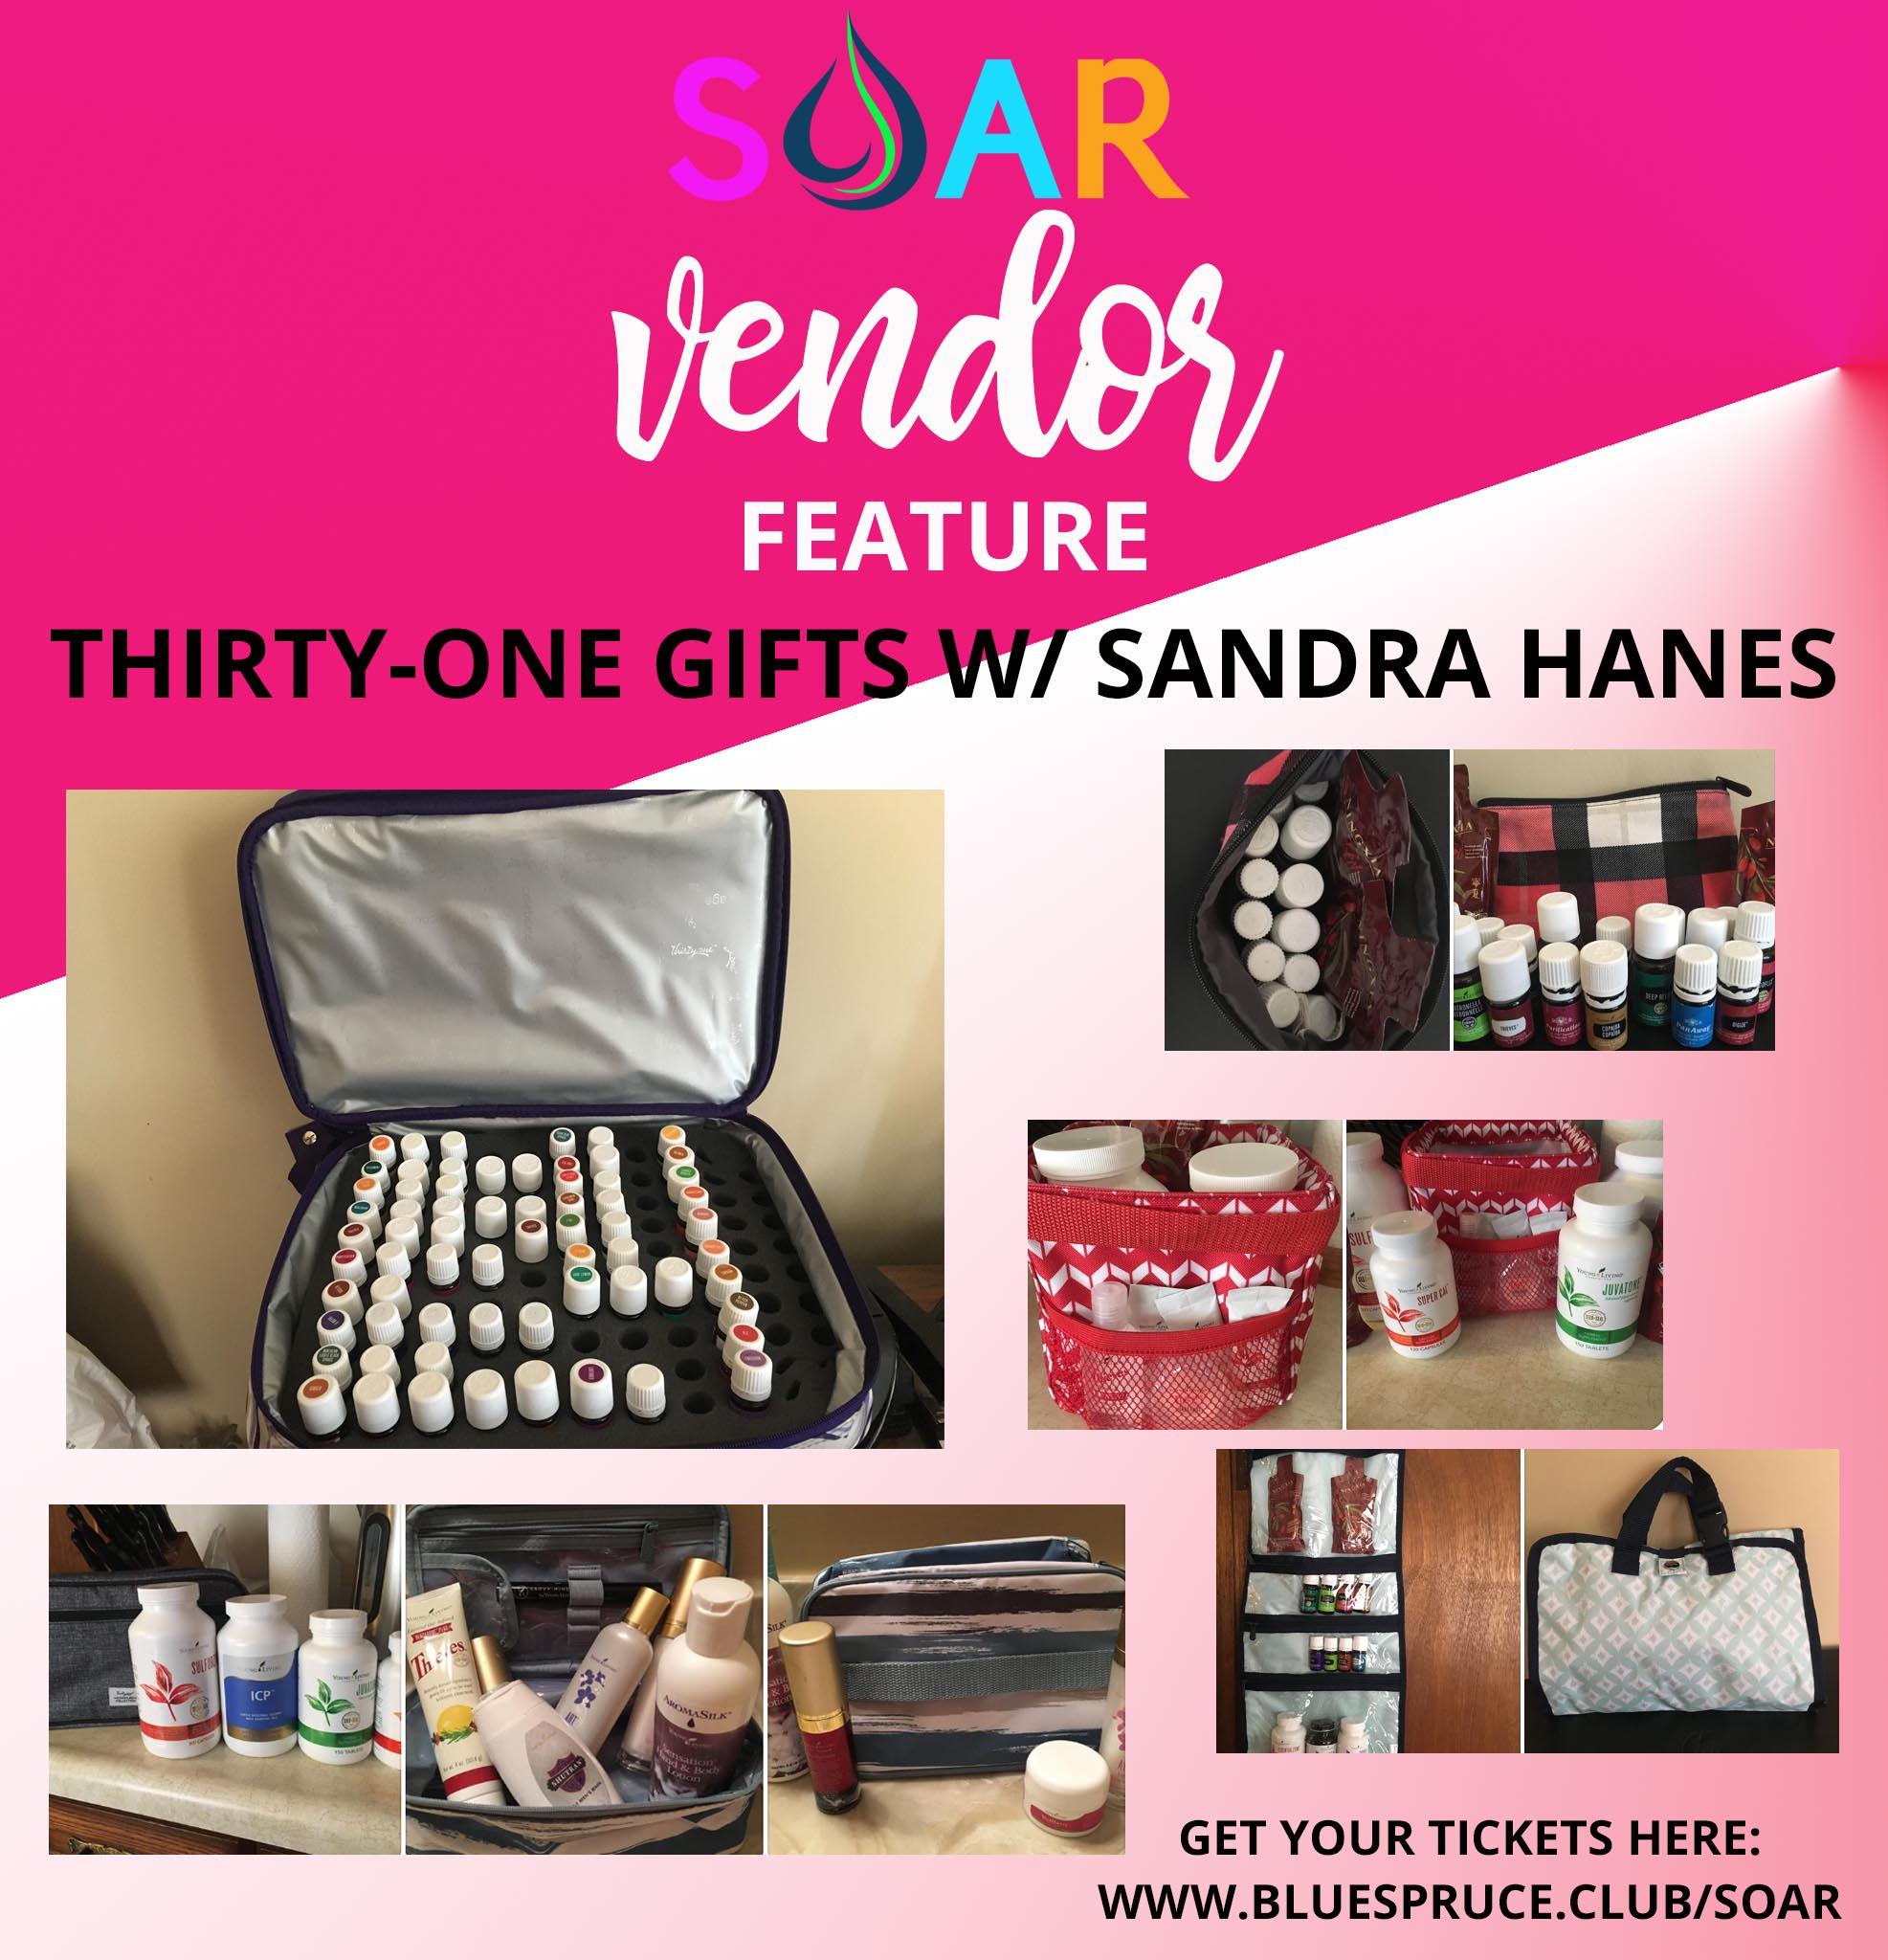 SOAR Vendor feature sandra hanes 31 gitfs.jpg